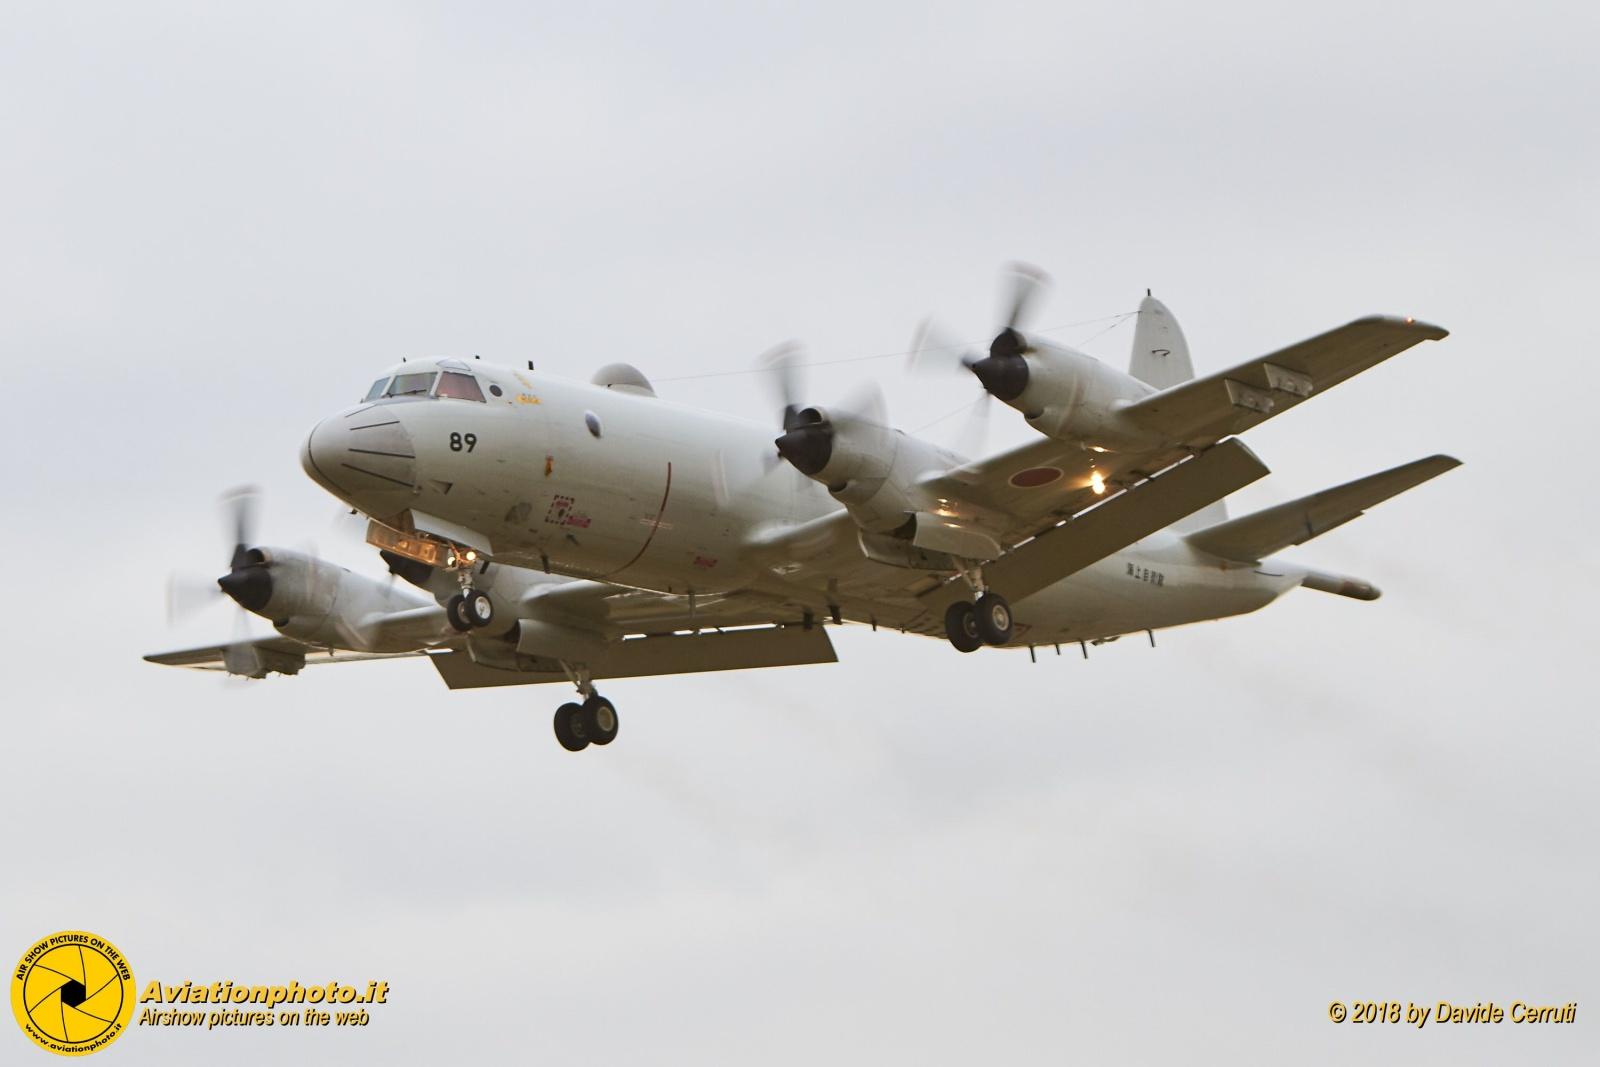 JSDAF Japan Self Defence Air Force - Atsugi Air Base